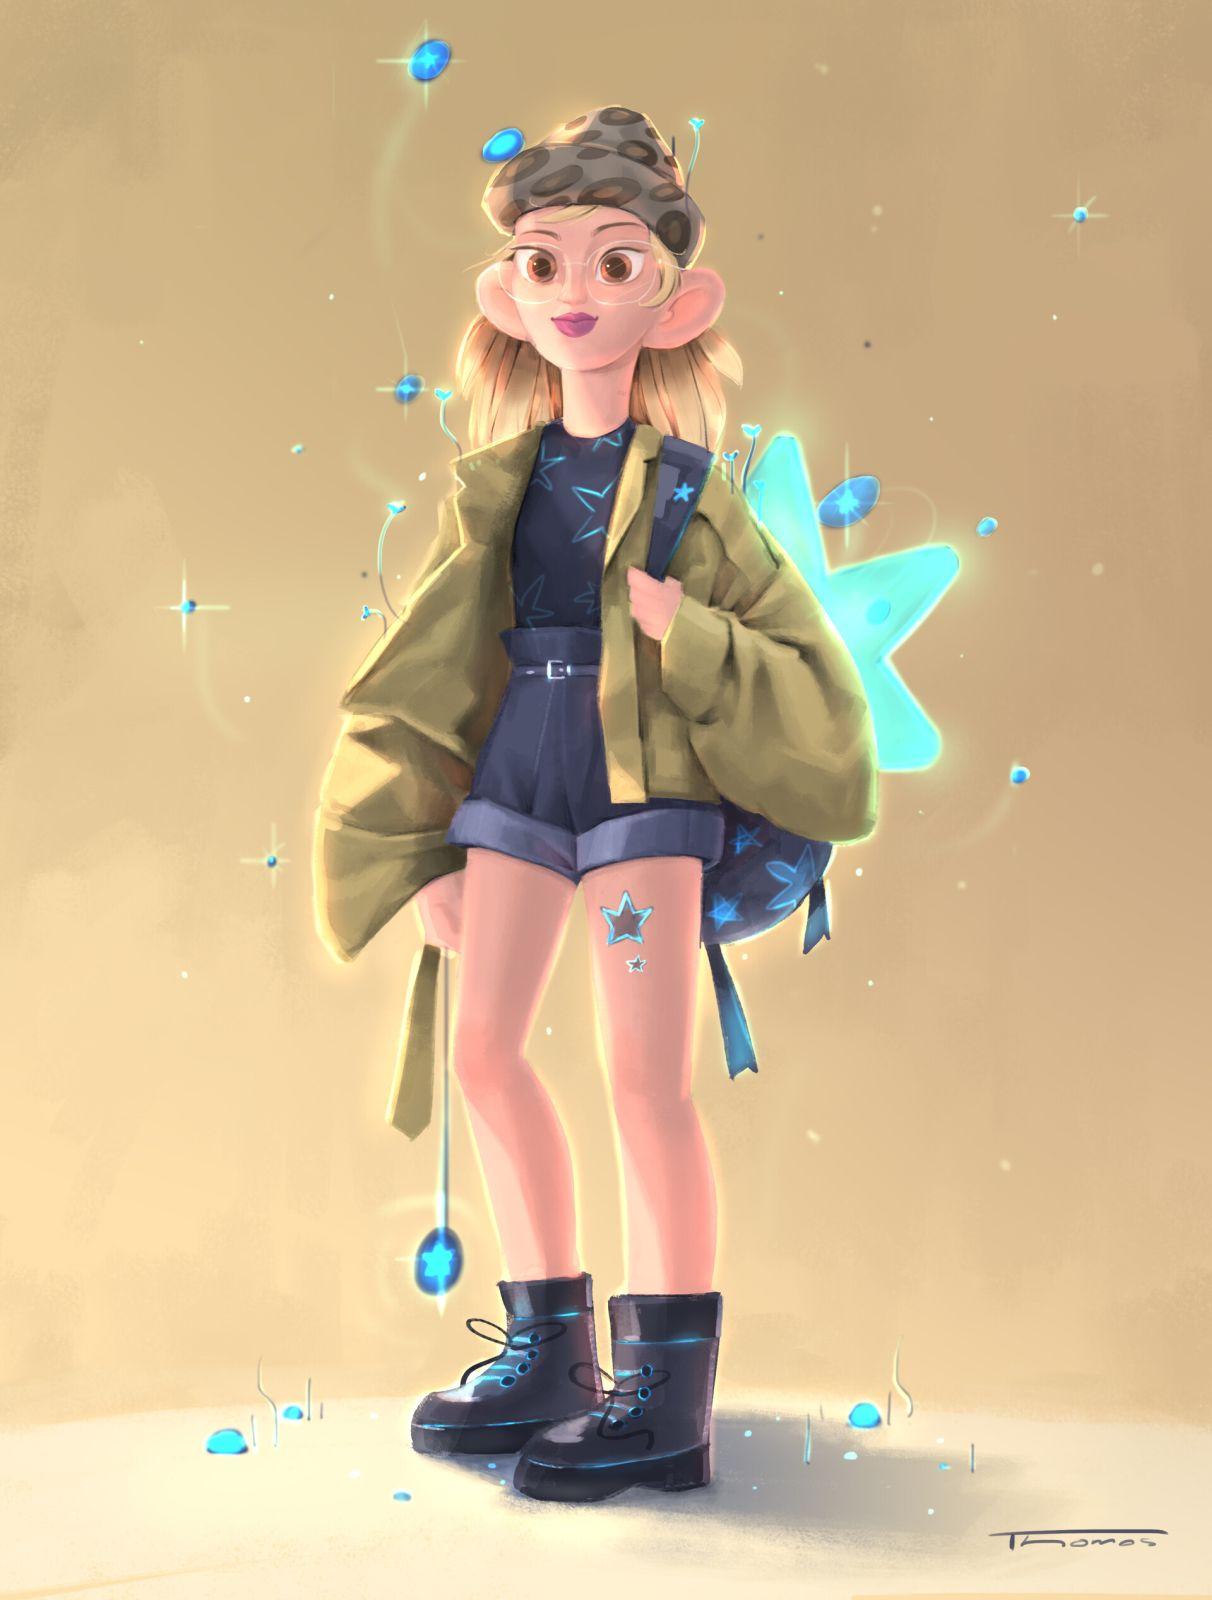 indian digital illustration girl